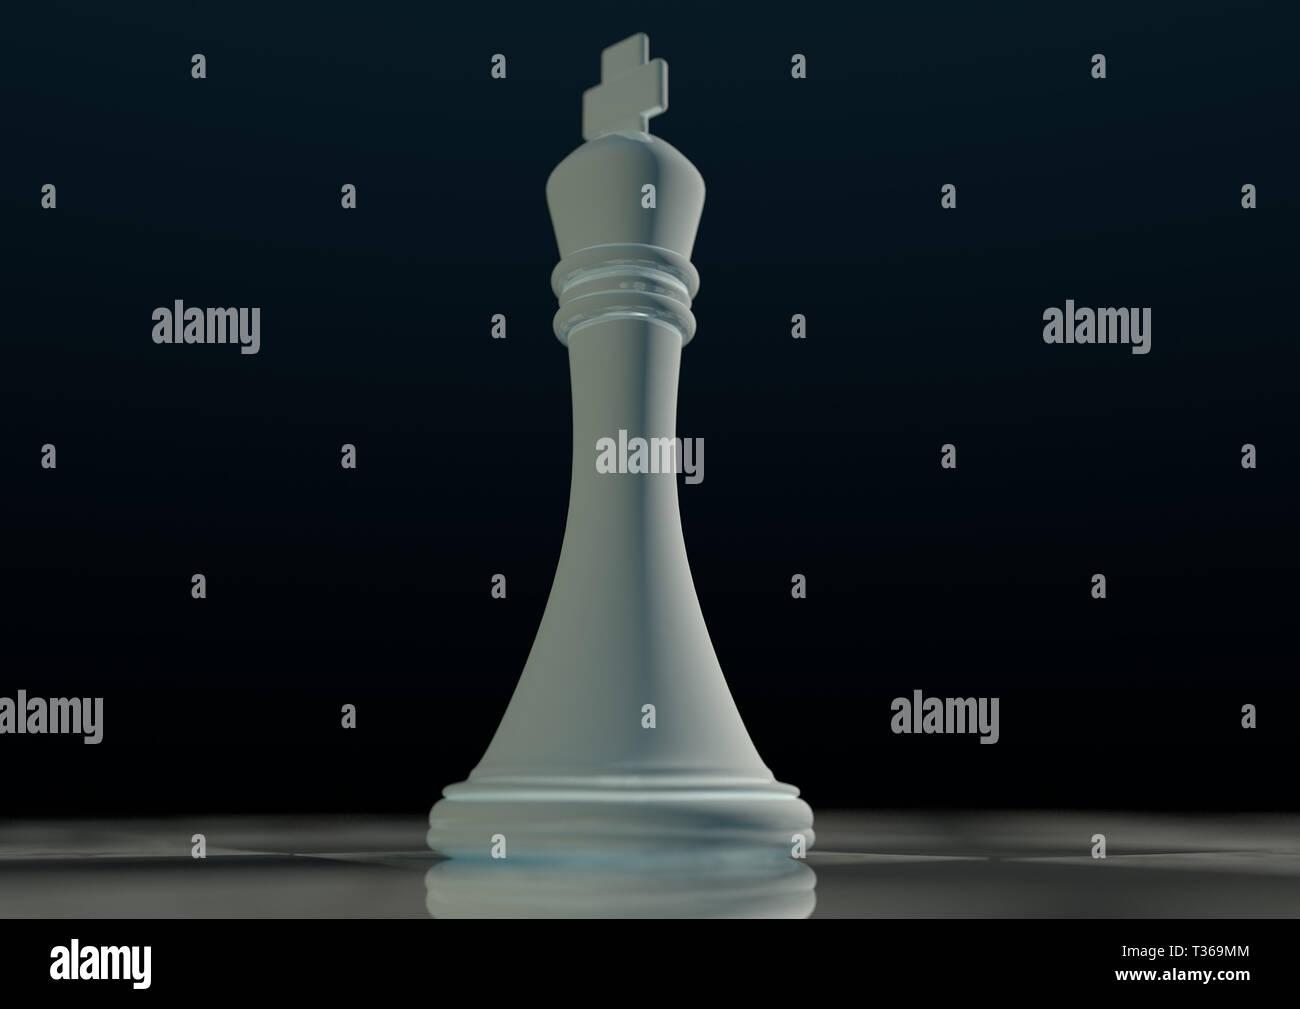 King Chess Piece Stock Photos & King Chess Piece Stock